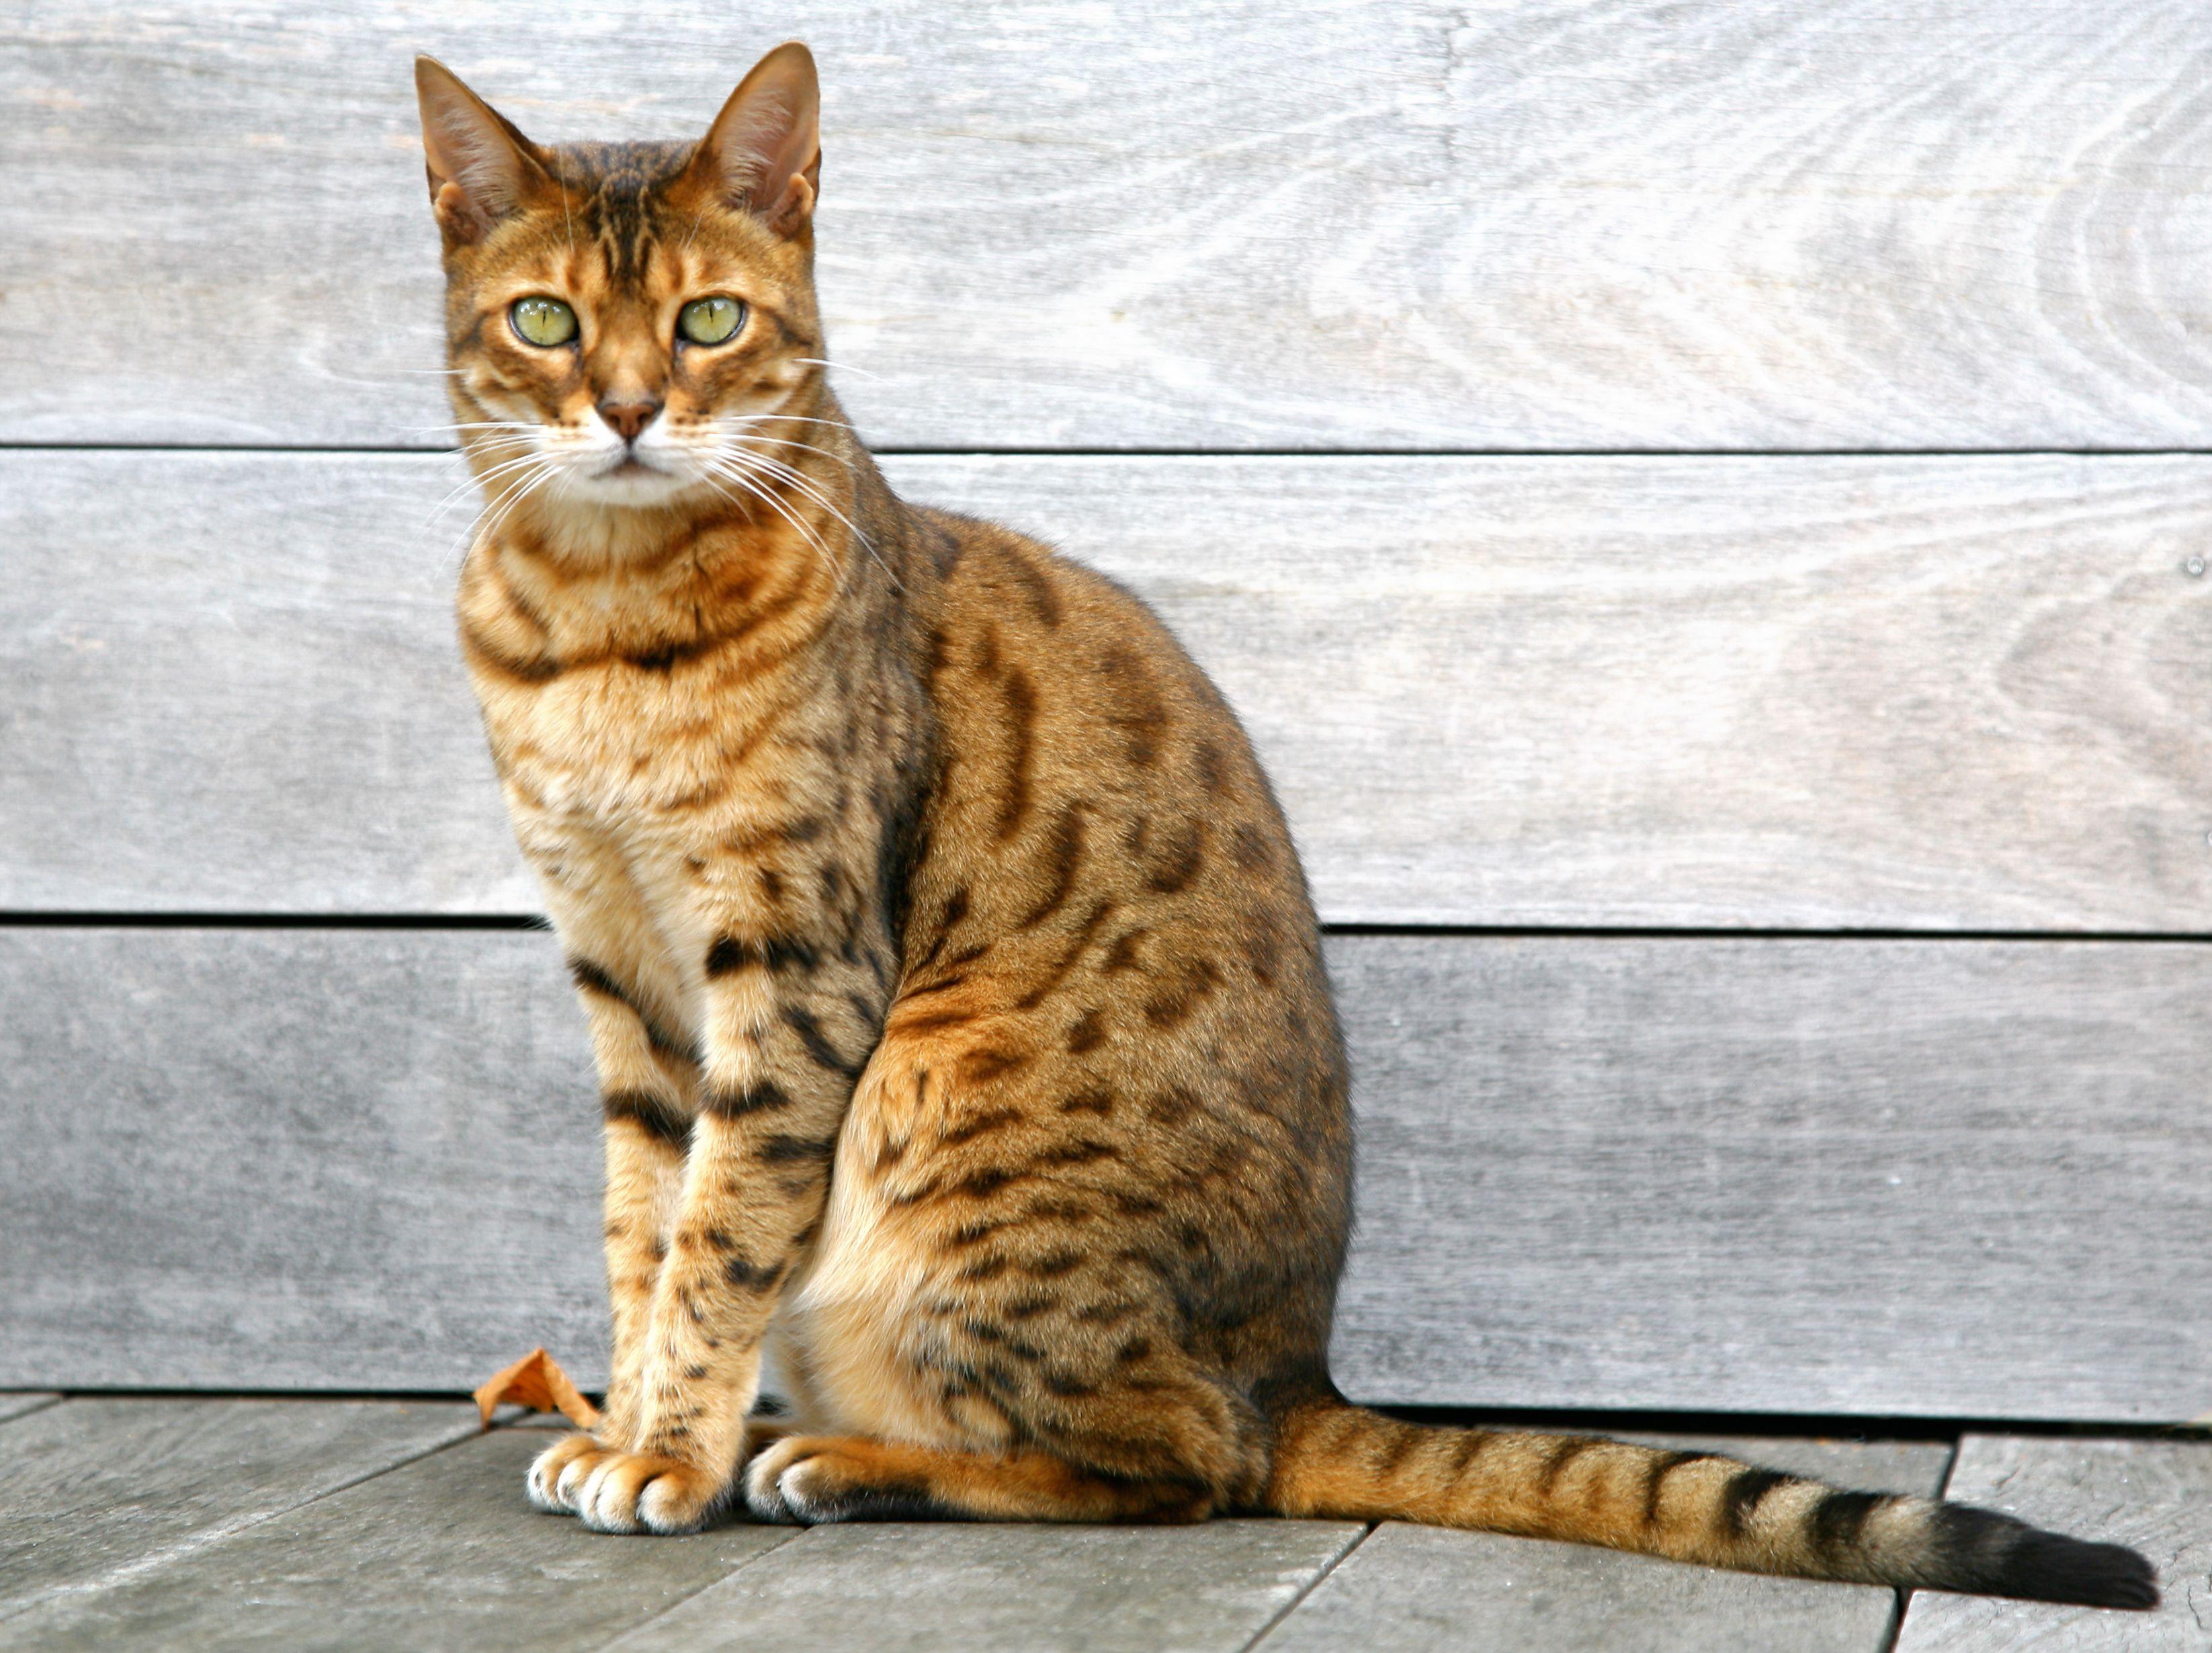 Bengal cat sitting upright